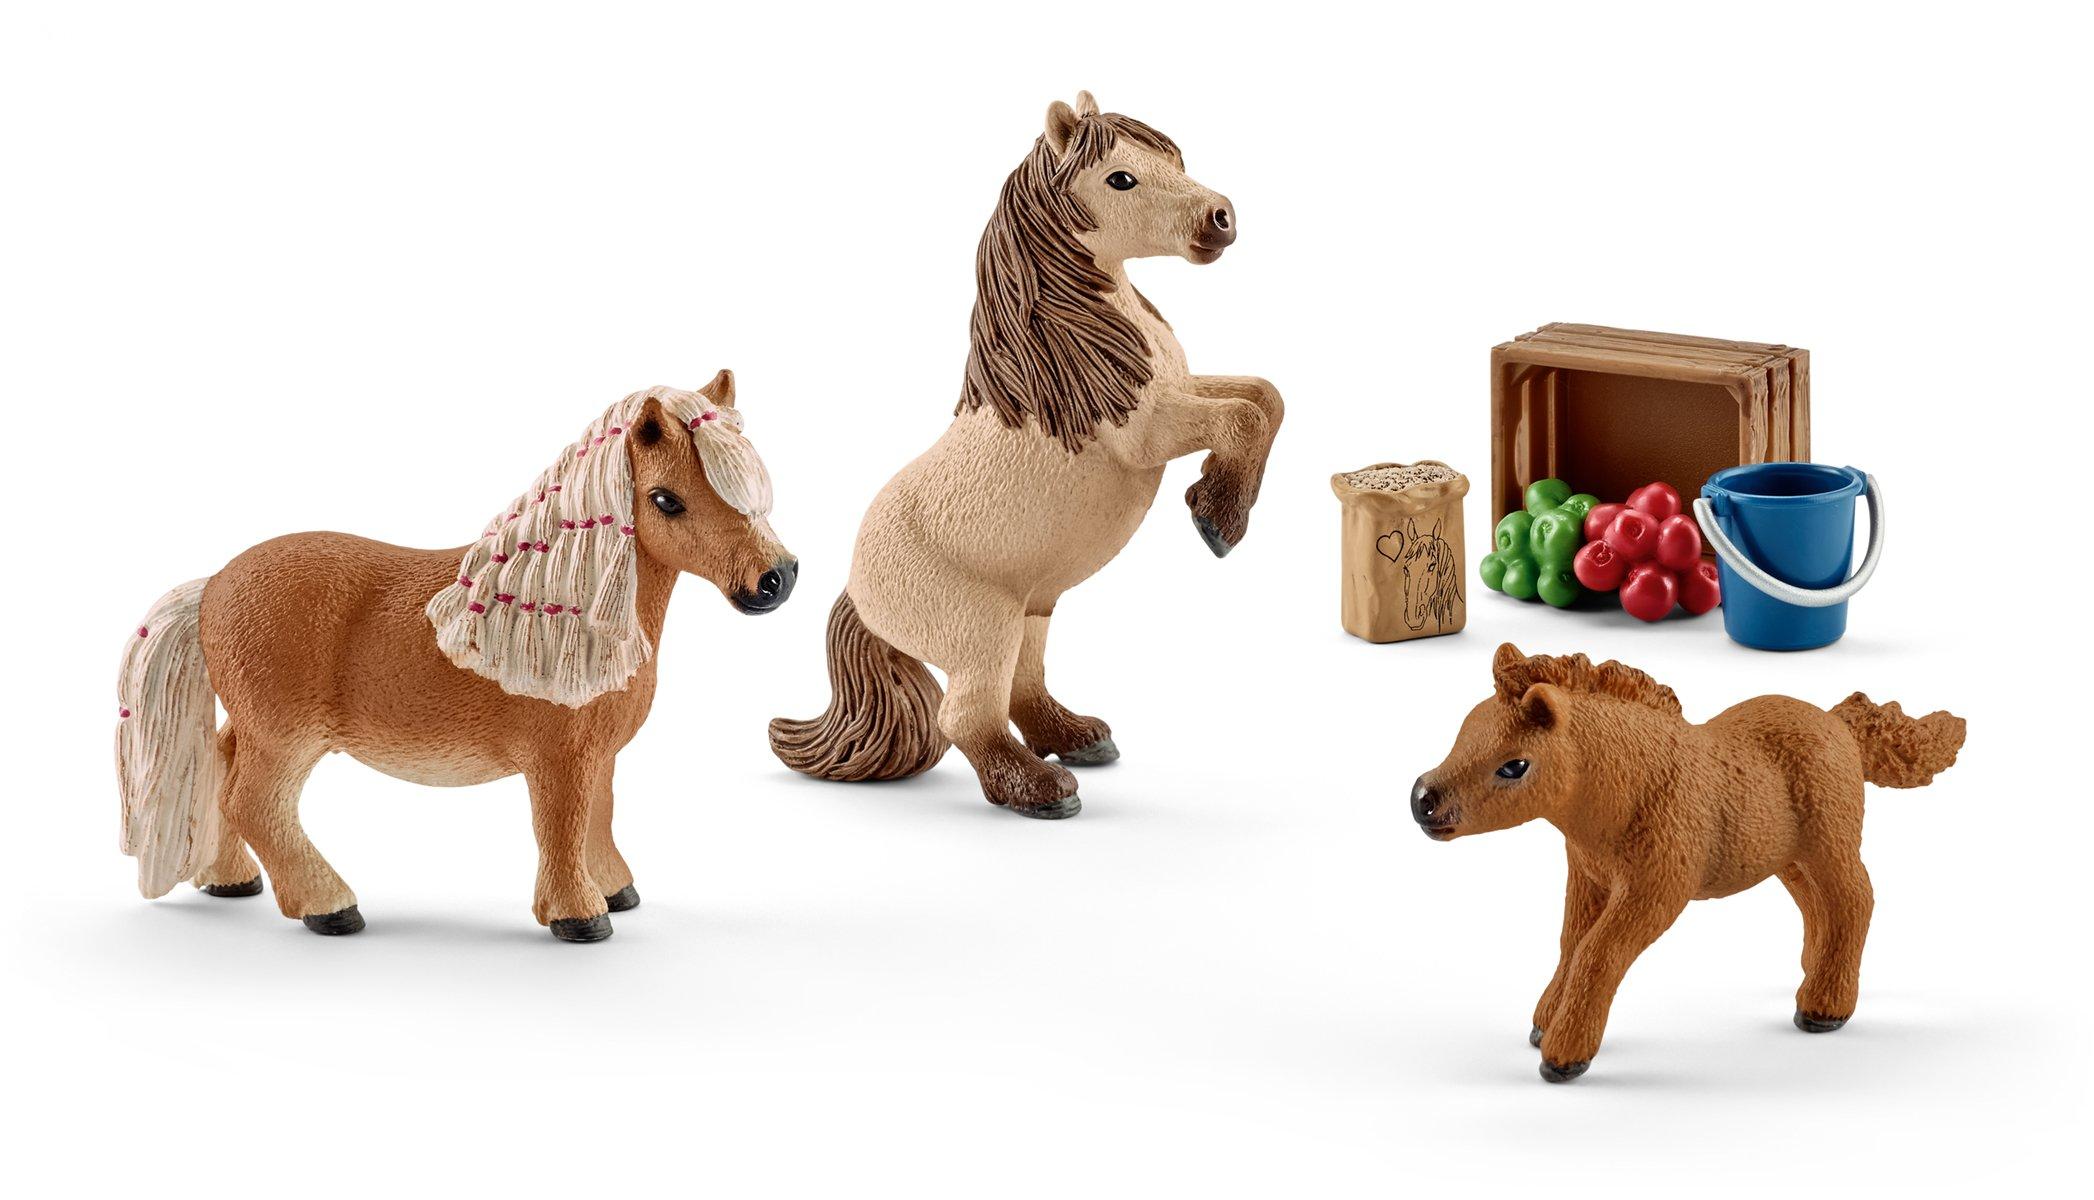 SCHLEICH 41432 Miniature Shetland Pony Family